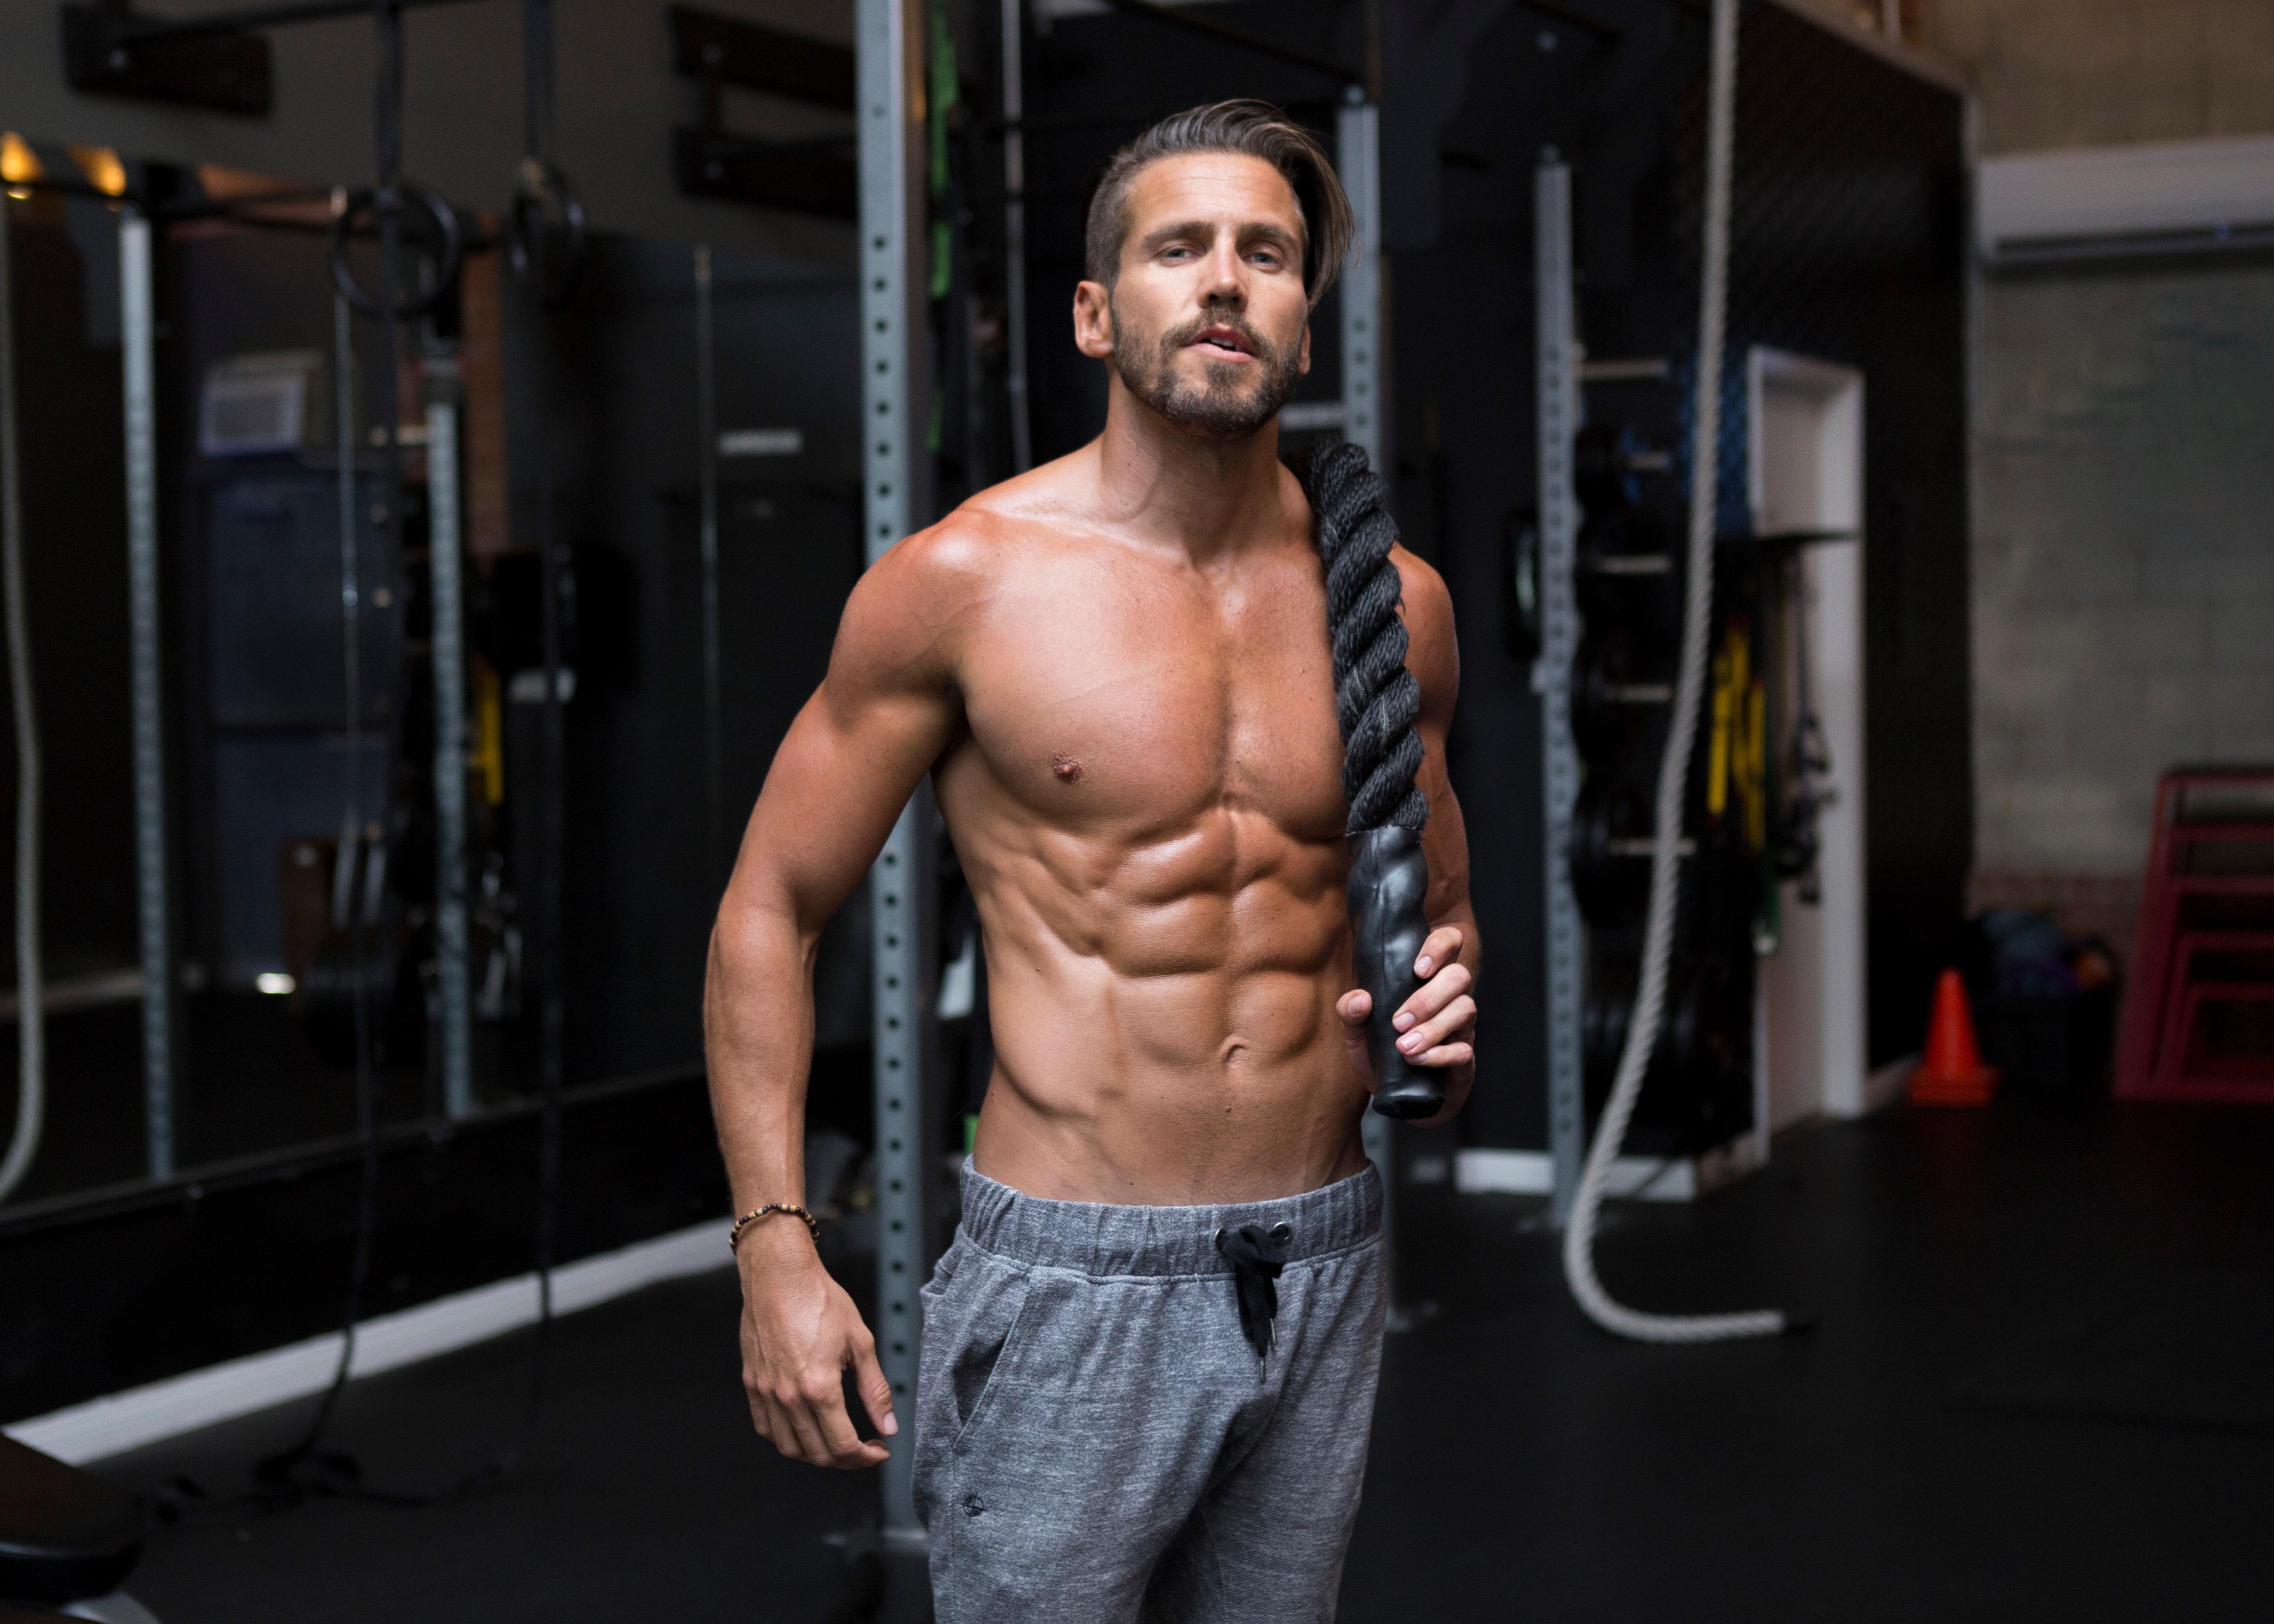 LA's Hottest Trainer 2015 - Racked LA